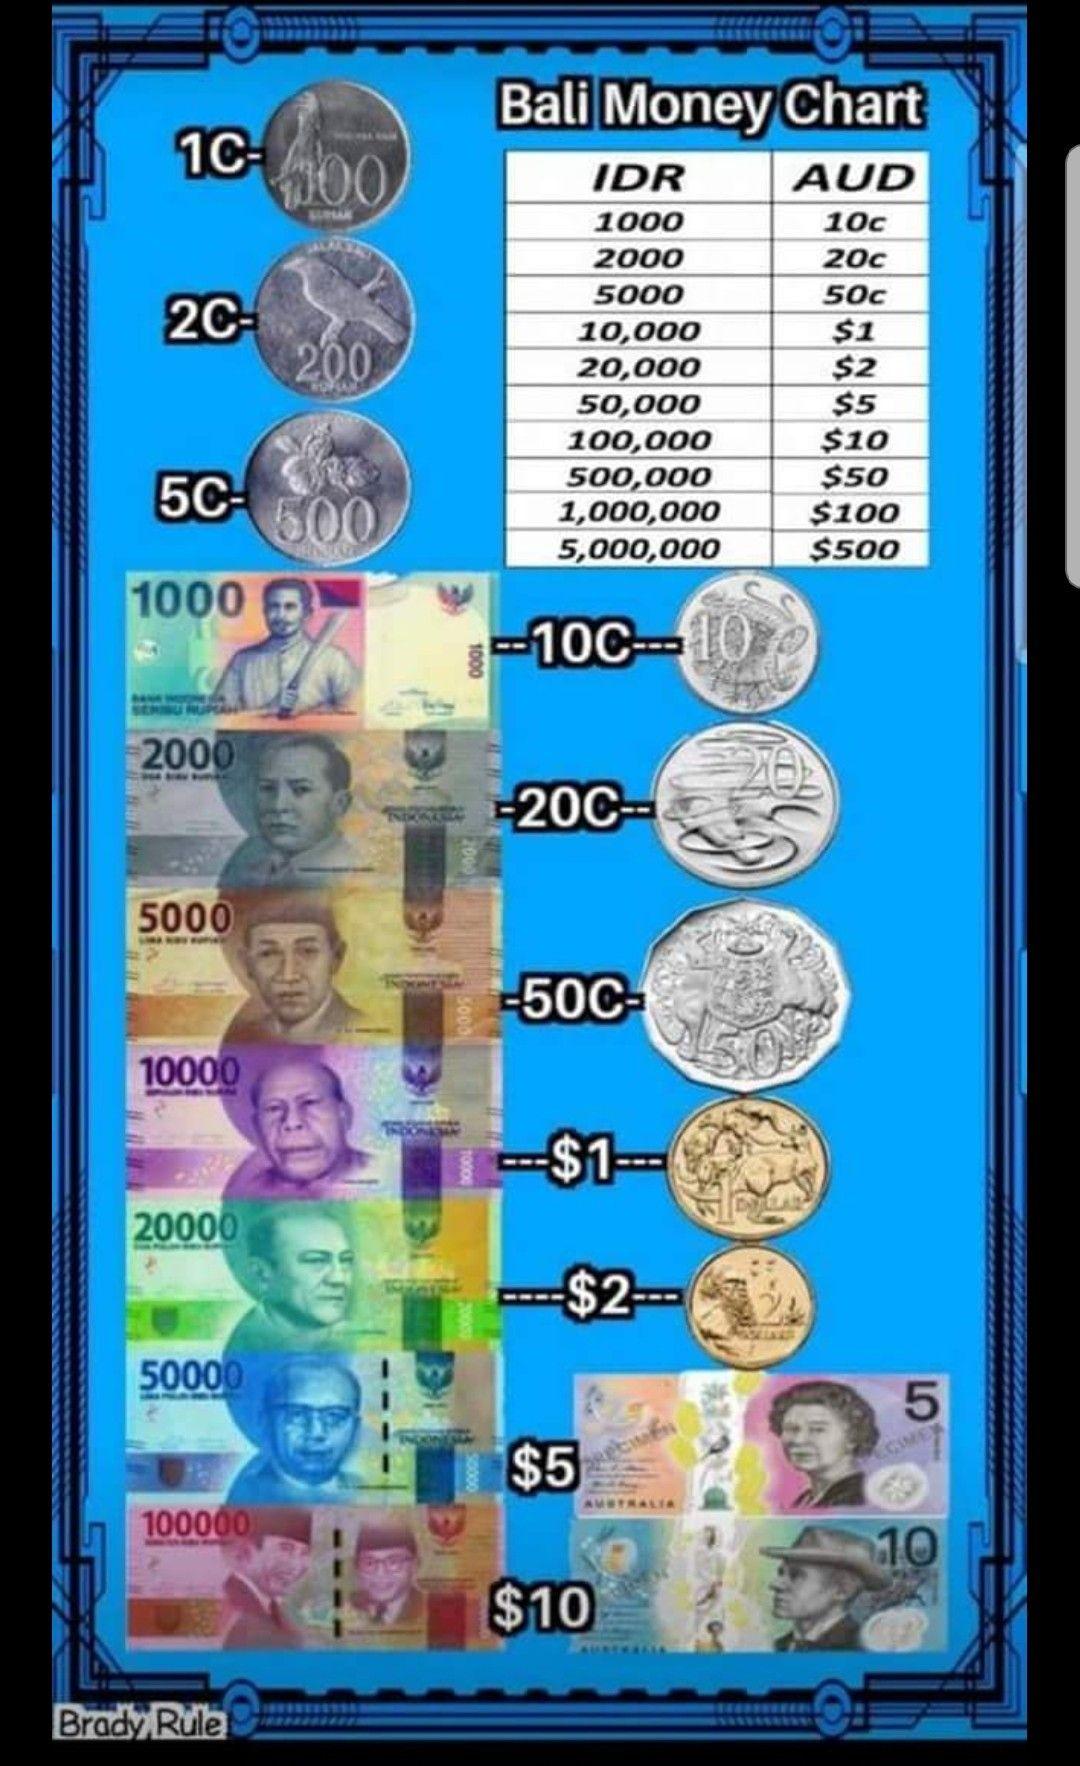 Exchange Rate Bali Money Chart Bali Gates Of Heaven